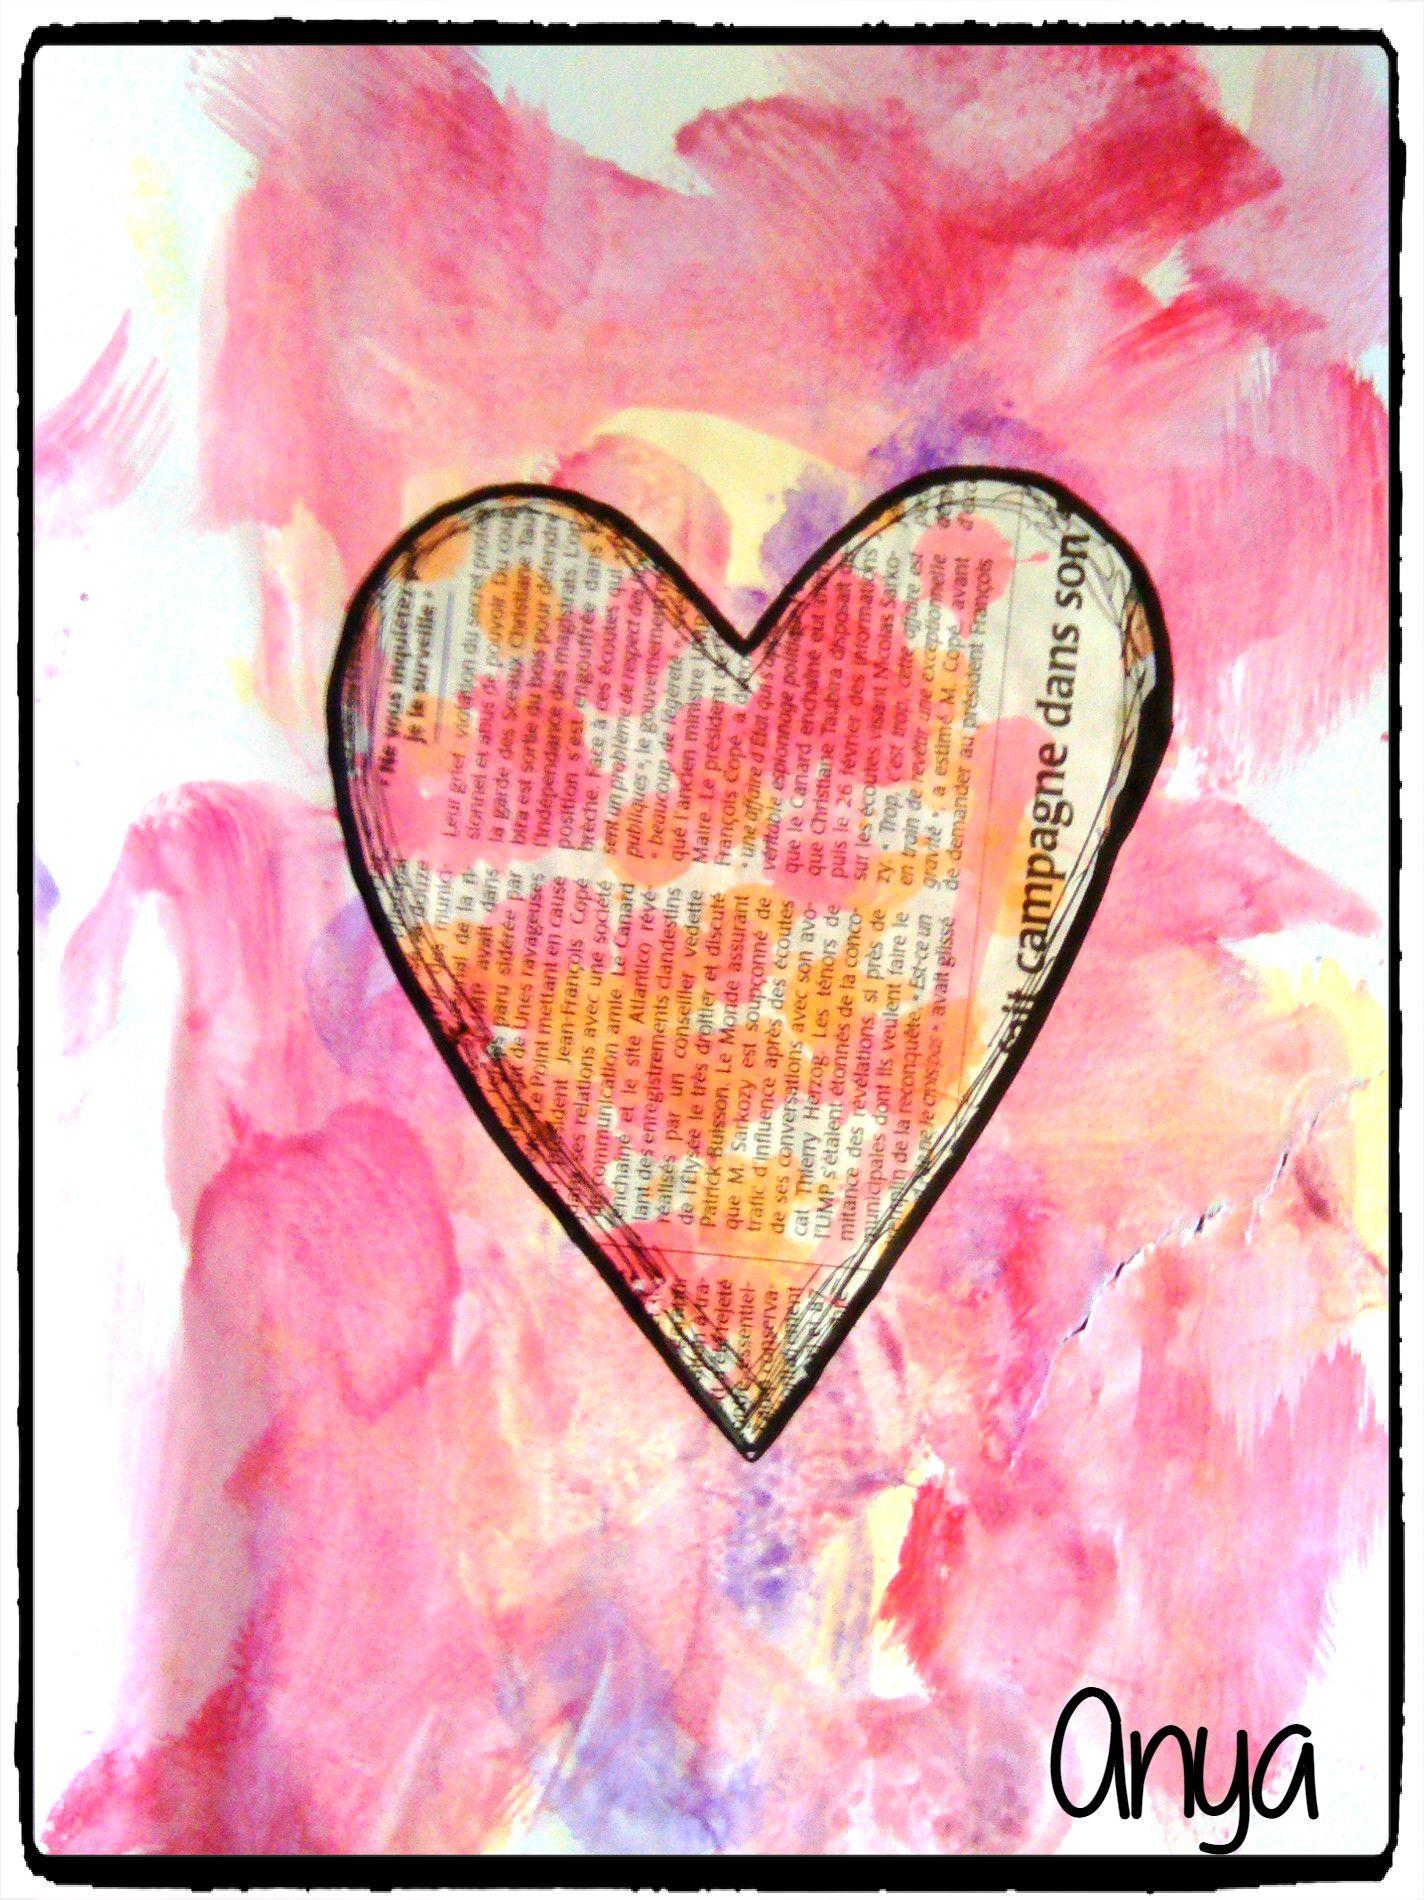 bricolage coeur saint valentin amour peinture enfant. Black Bedroom Furniture Sets. Home Design Ideas